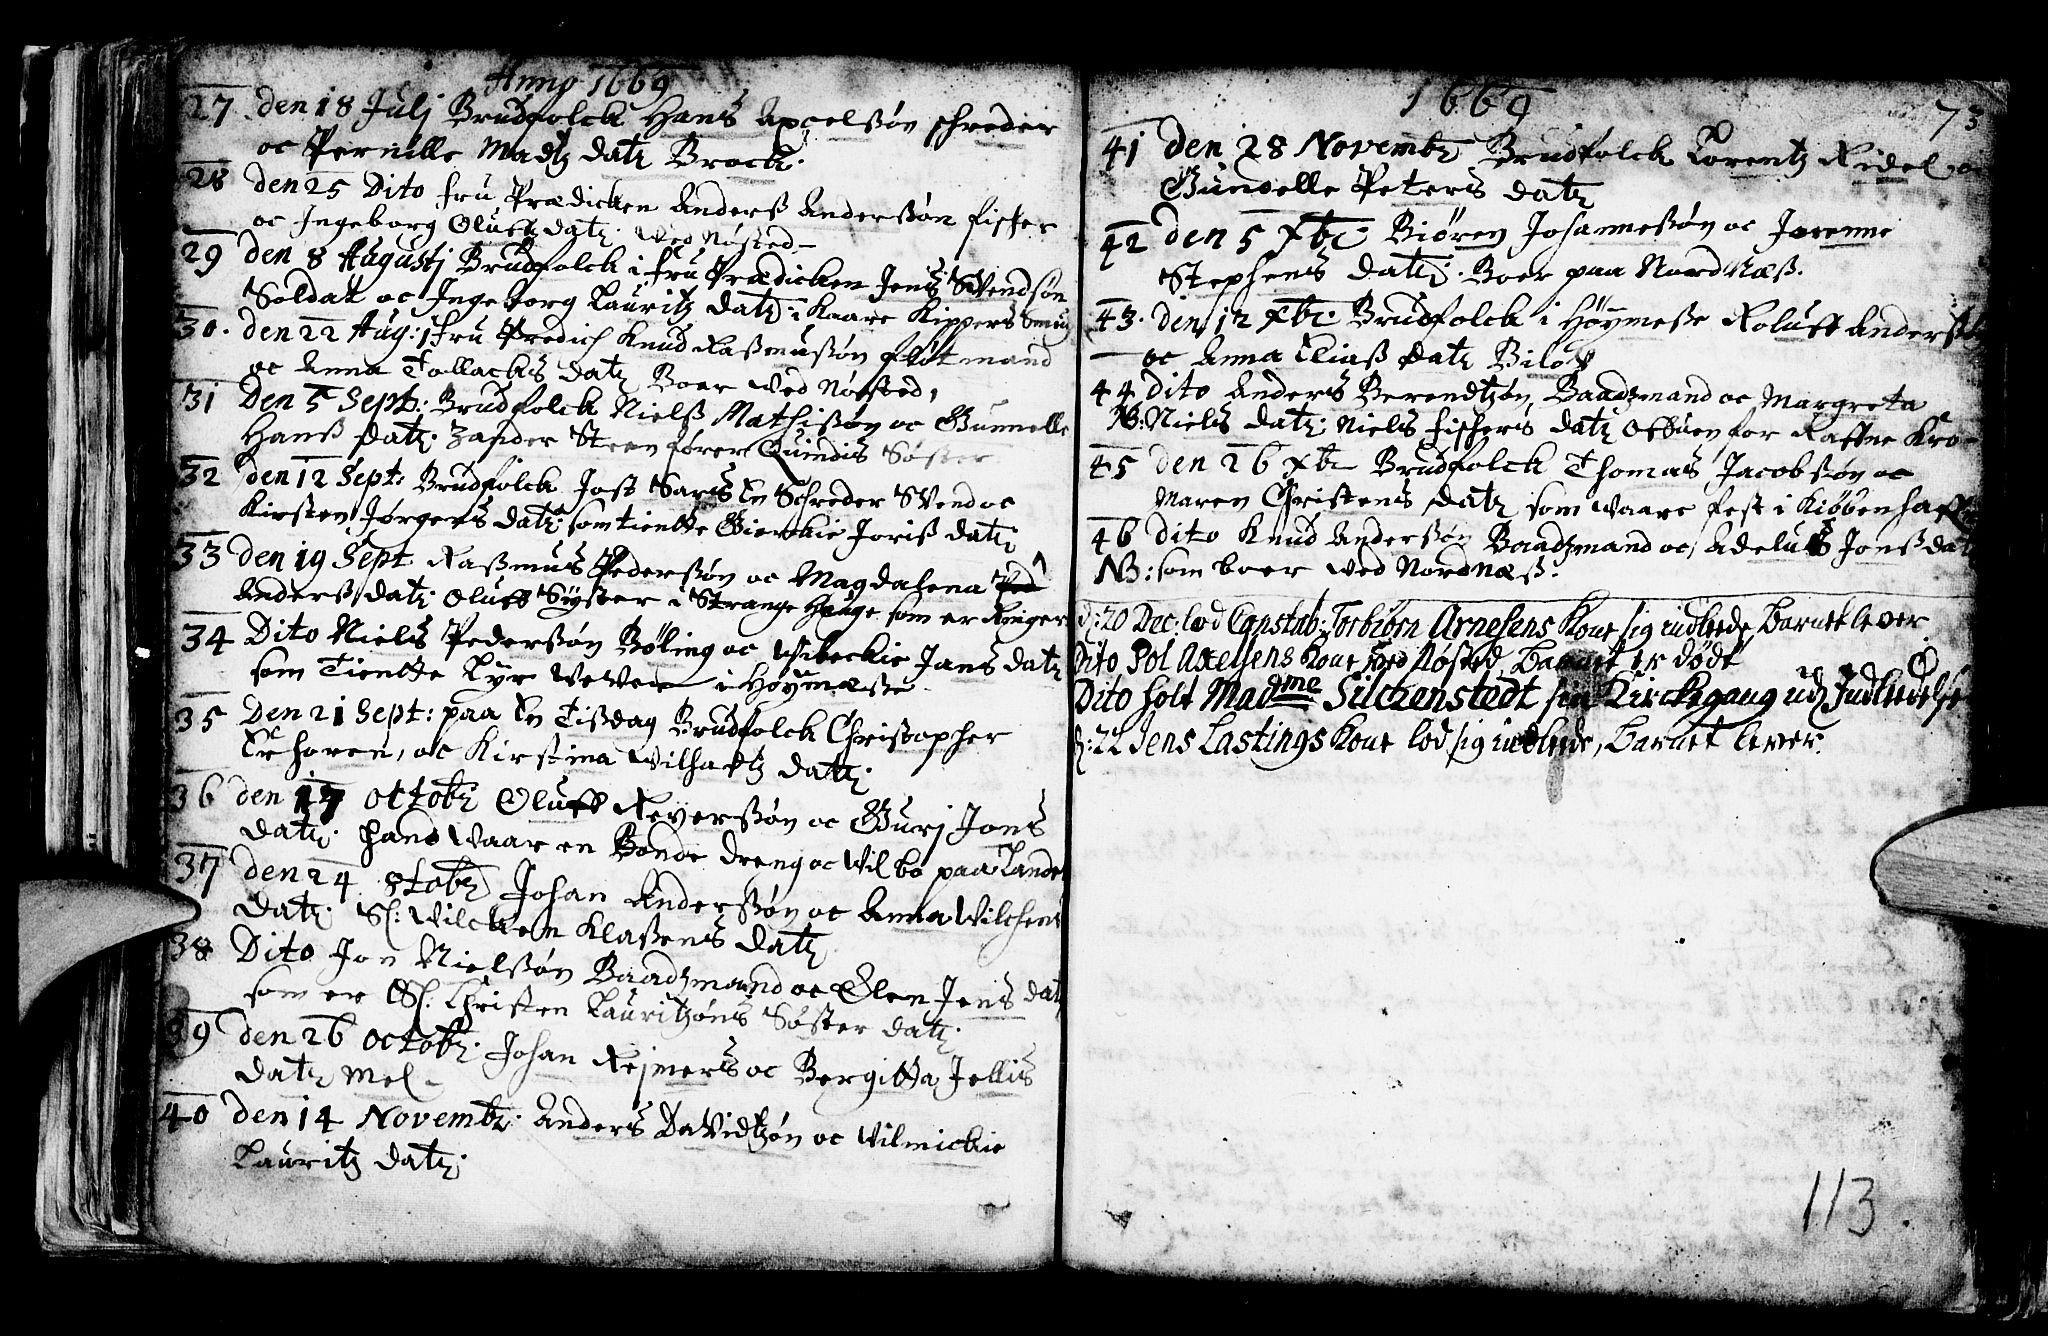 SAB, Nykirken Sokneprestembete, H/Haa: Ministerialbok nr. A 1, 1668-1820, s. 113